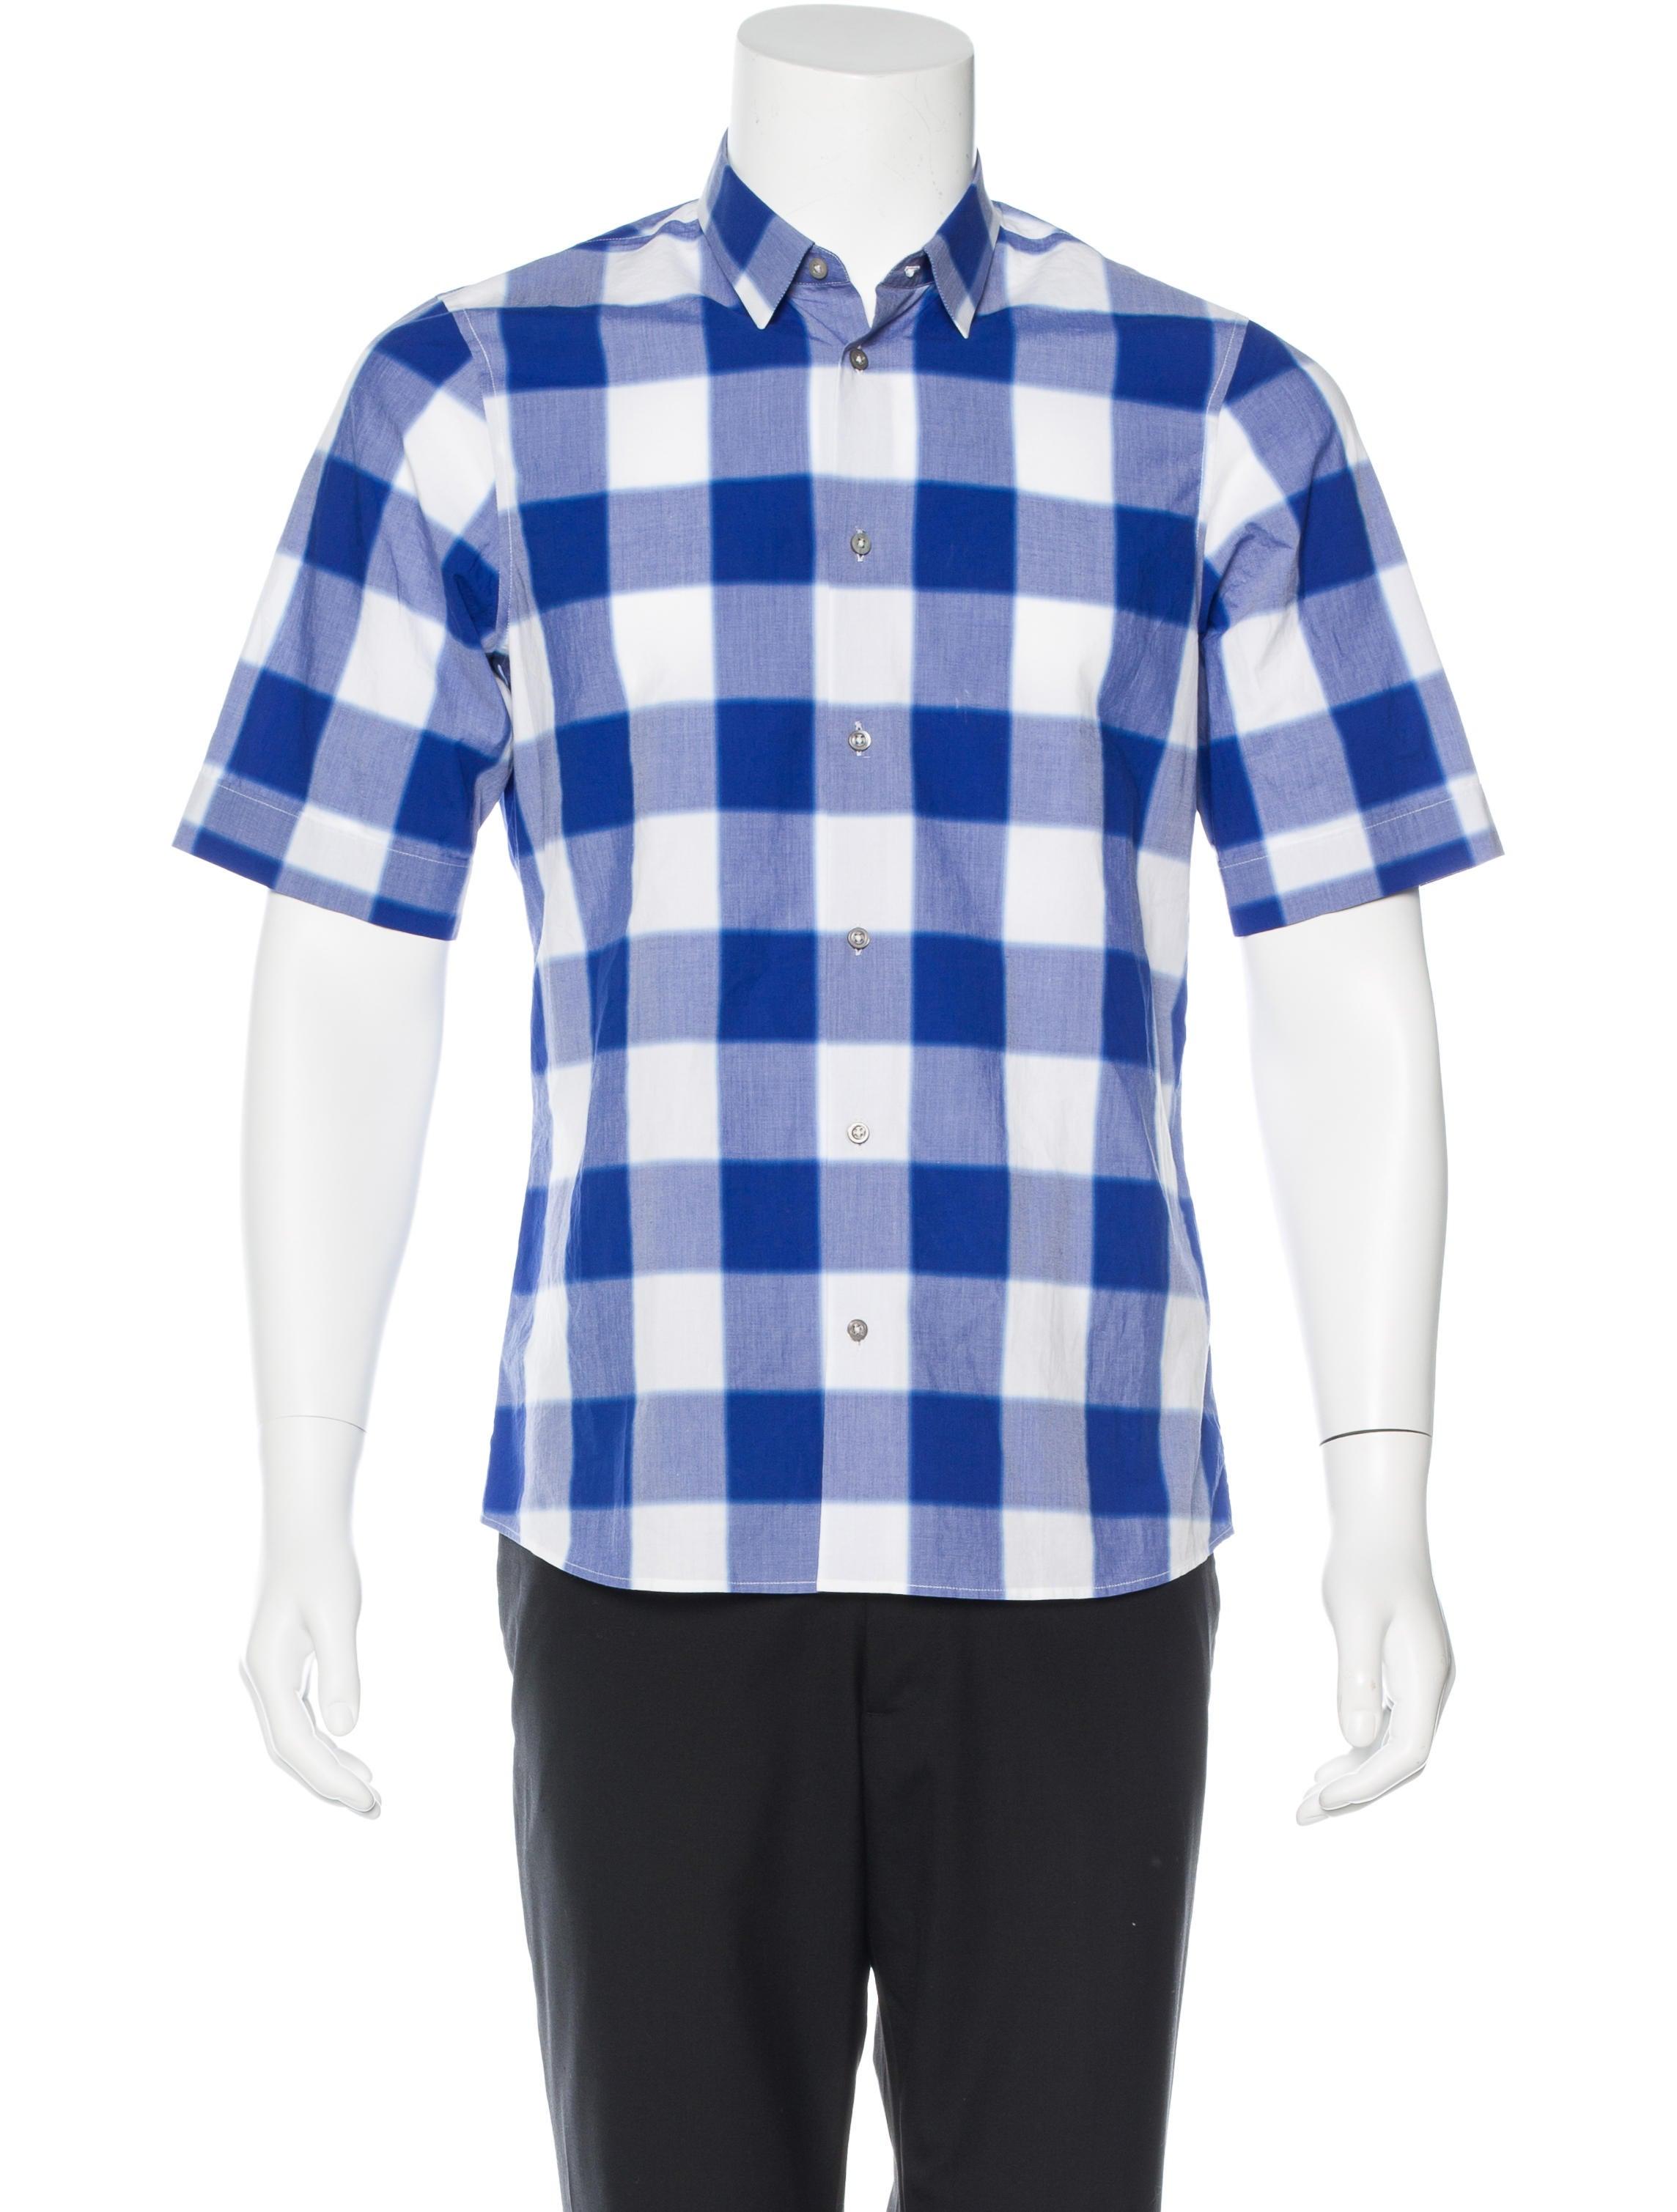 Jil sander plaid woven shirt clothing jil32890 the for Jil sander mens shirt